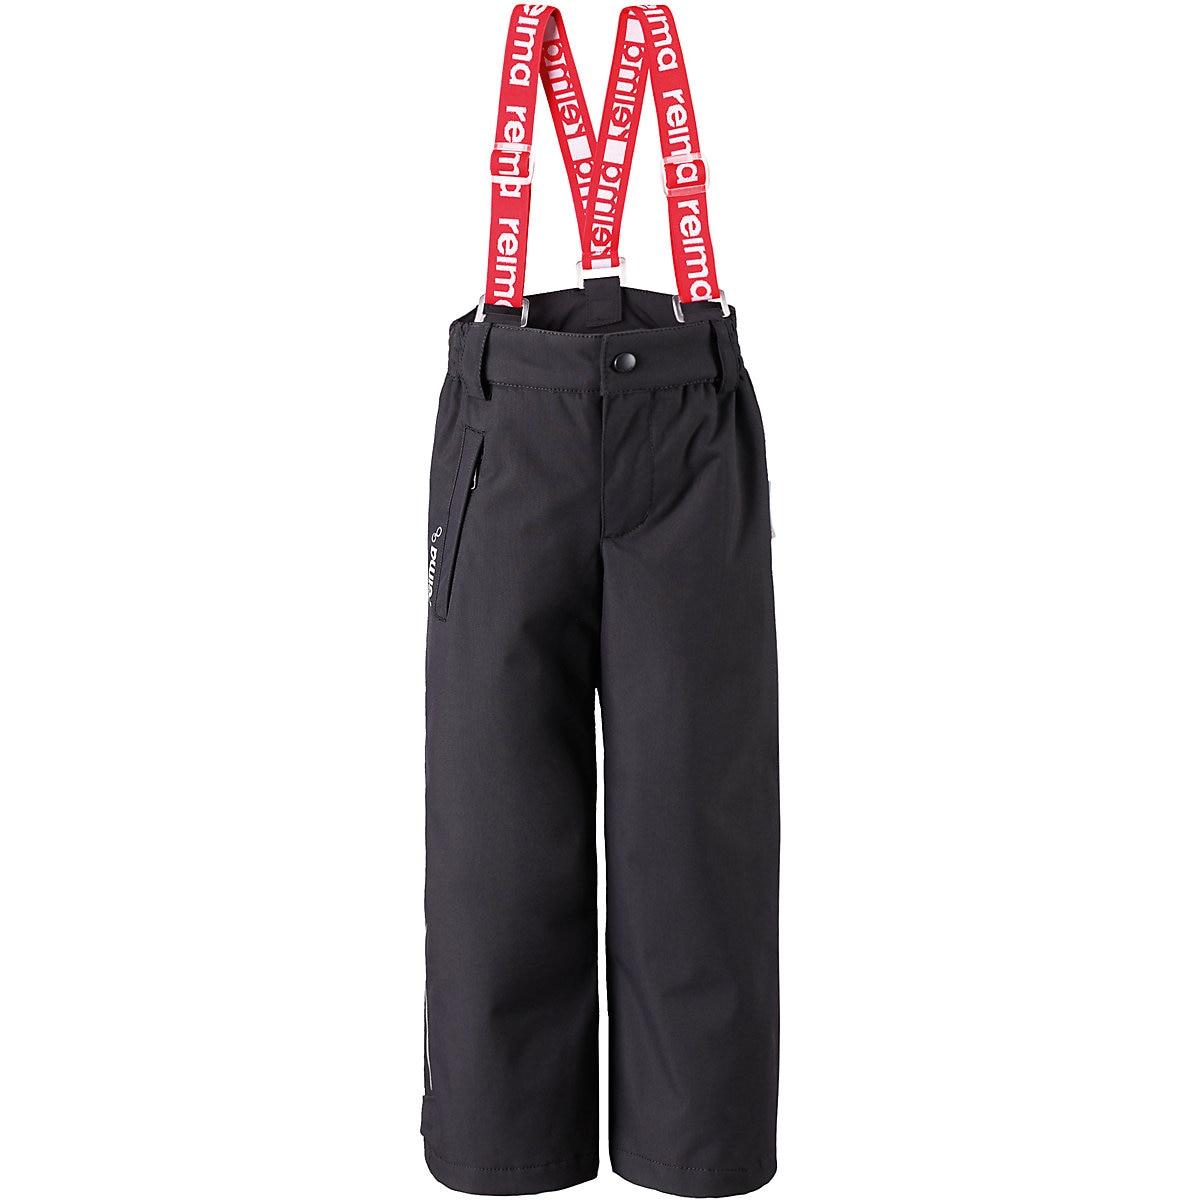 Pants & Capris Reima 8637108 for boys polyester autumn winter bomhcs cute women autumn winter 100